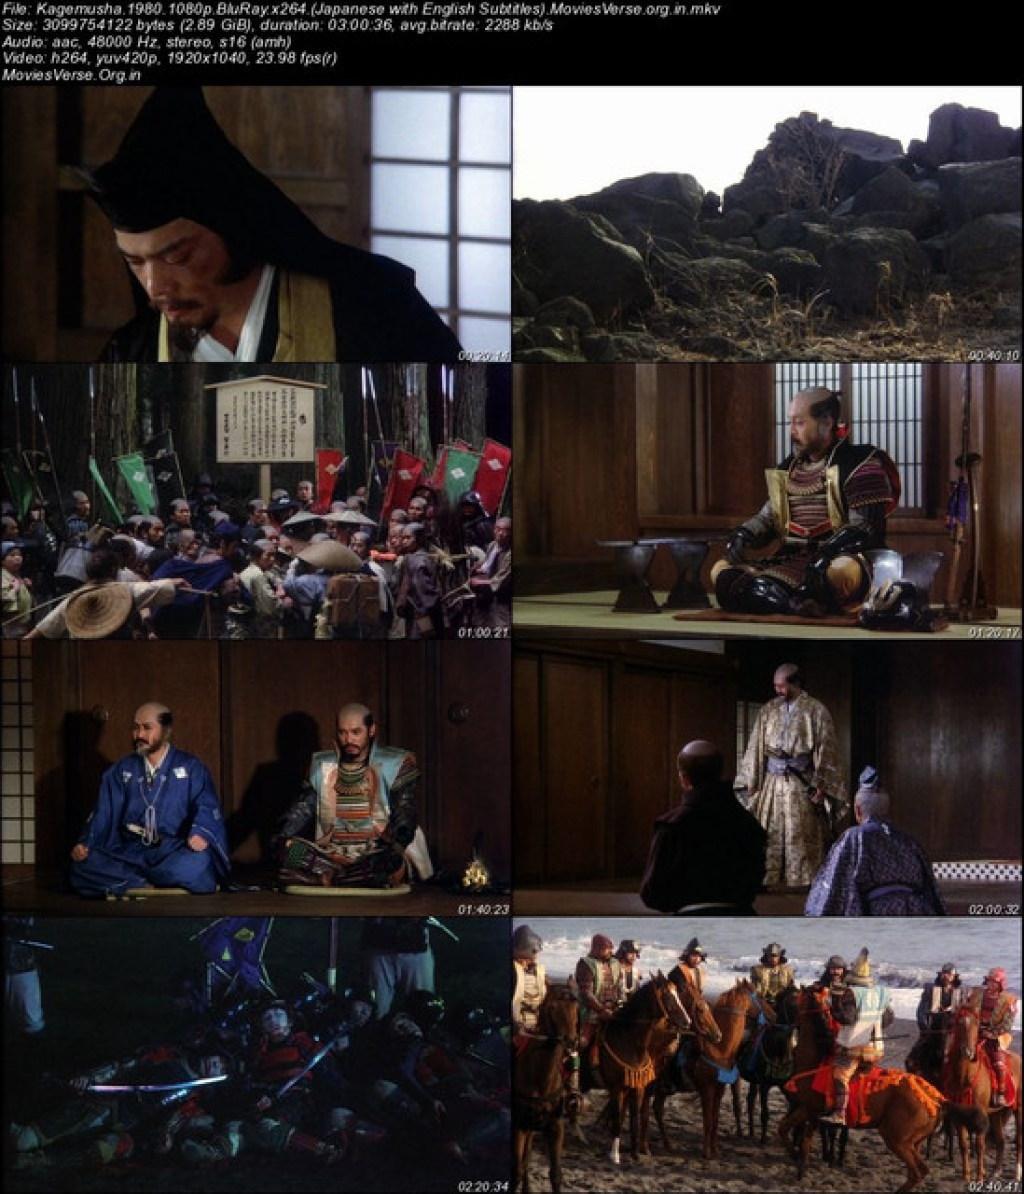 Kagemusha-1980-1080p-Blu-Ray-x264-Japanese-with-English-Subtitles-Movies-Verse-org-in